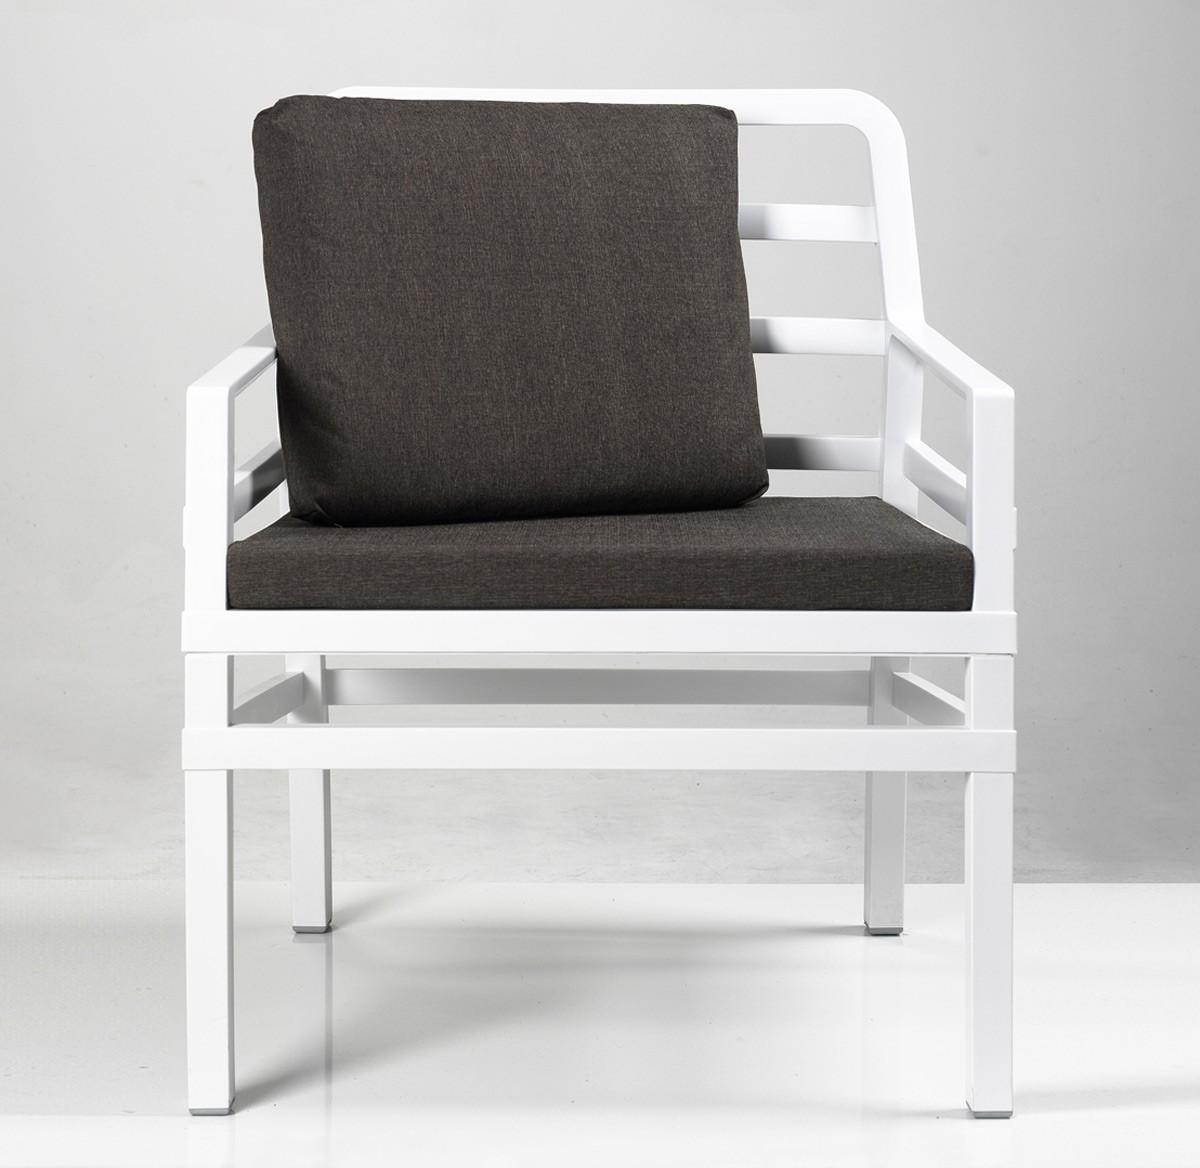 gartensessel sofa lounge aria kunststoff wei kissen kaffee bei. Black Bedroom Furniture Sets. Home Design Ideas